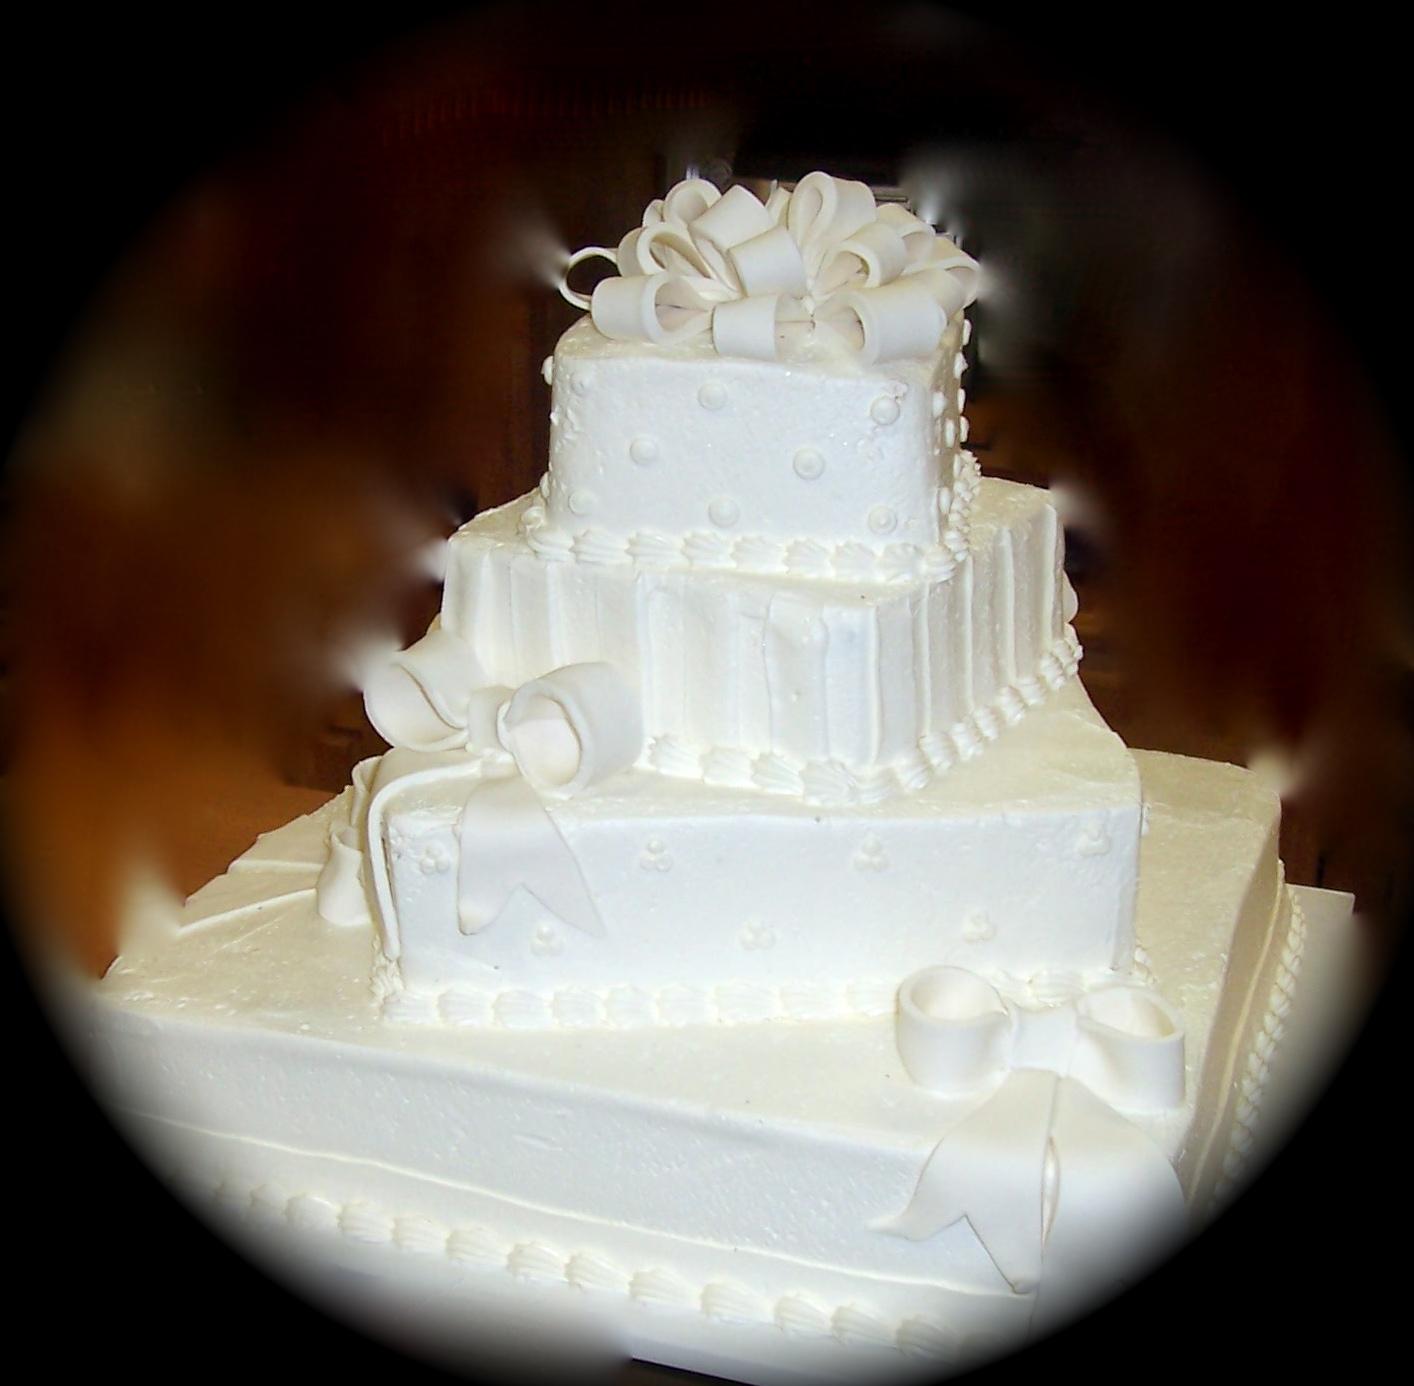 Winter Wedding Cake Flavors: Town Crier Bakery 215-794-9910: December 2009